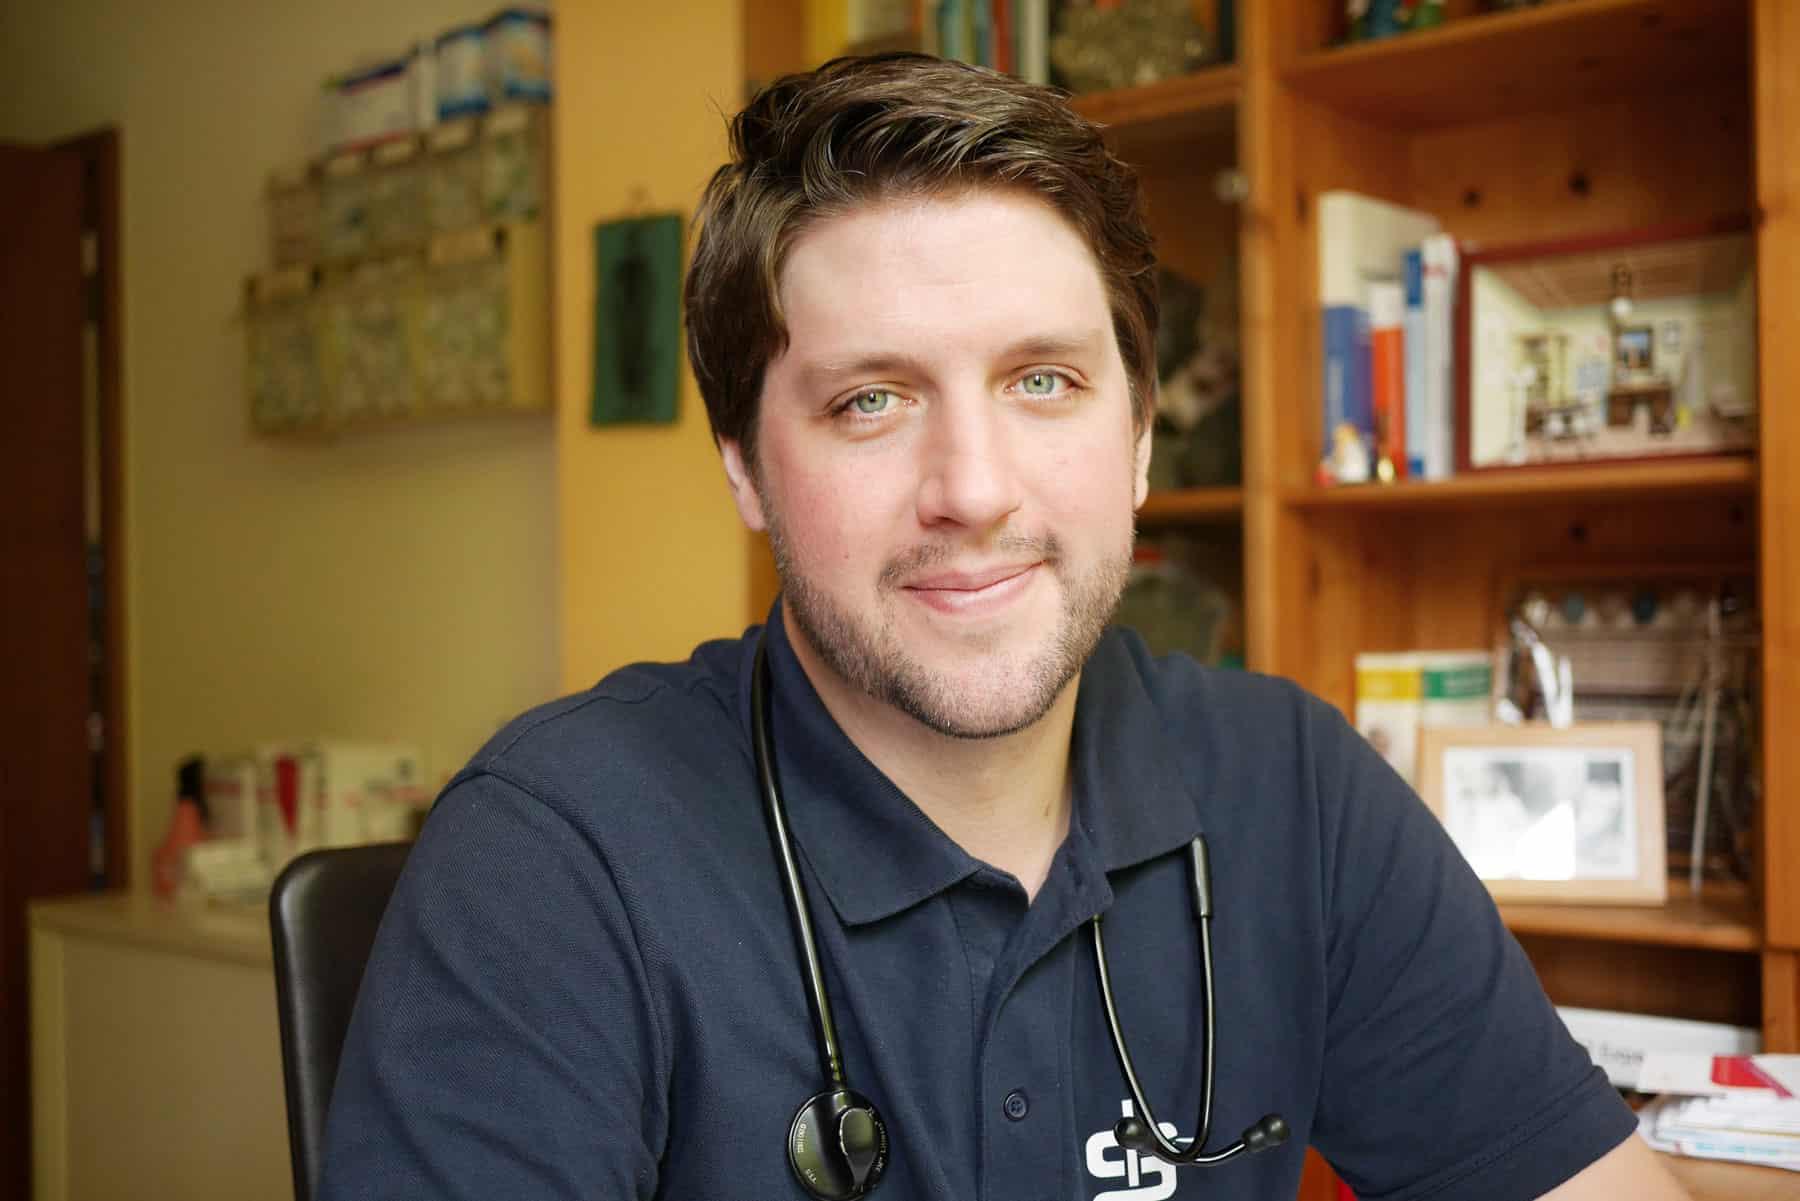 Hausarzt Heilbronn: Dr. med. Patrick Clemens